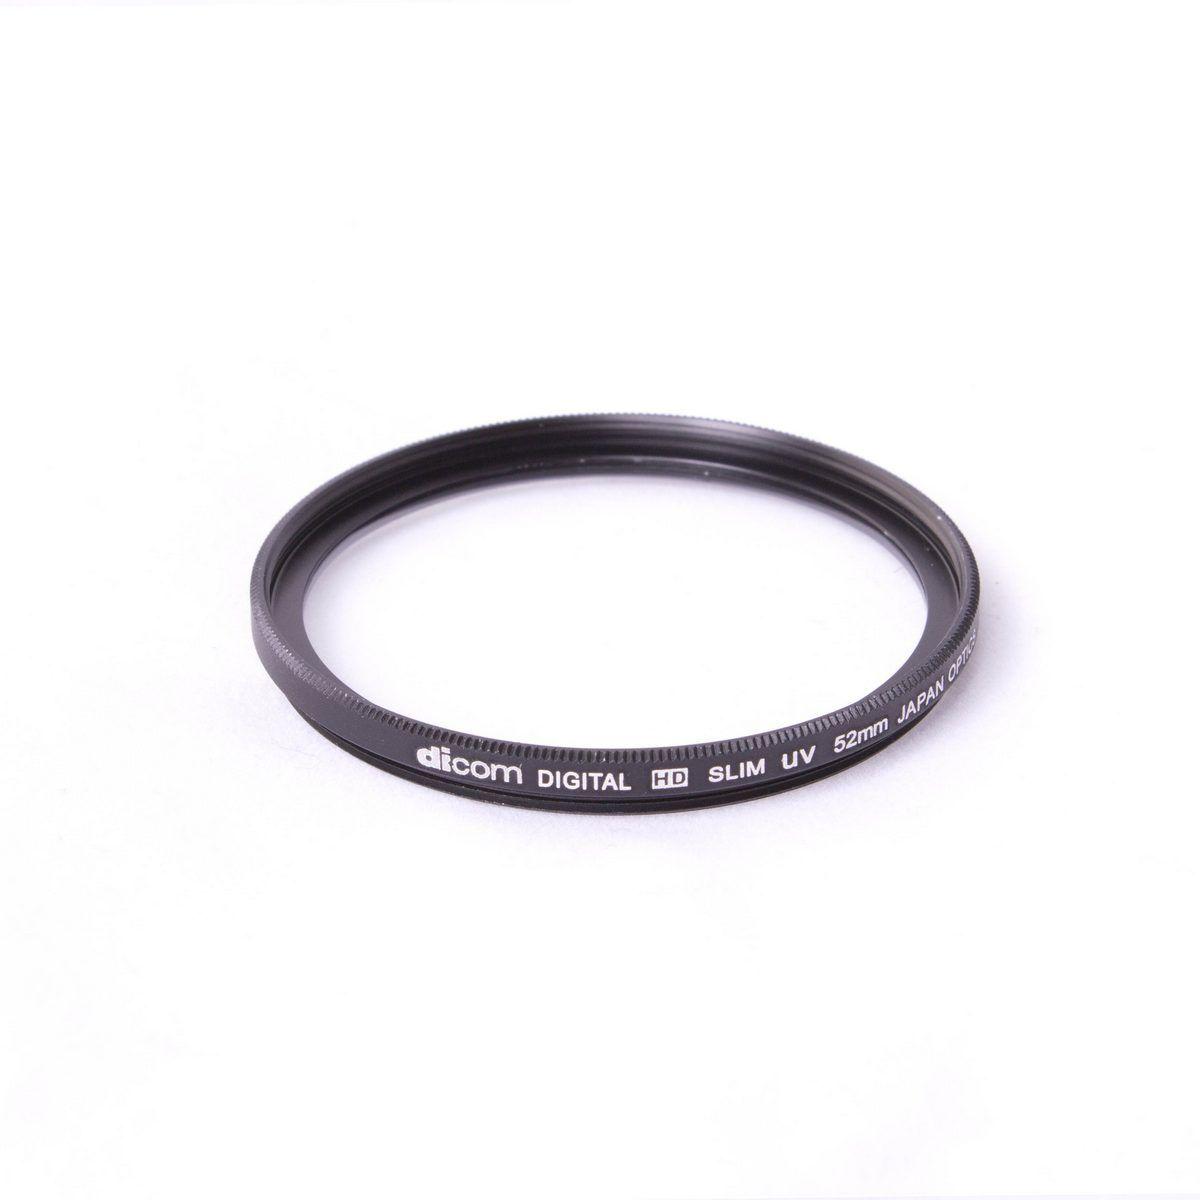 Dicom D-UVS52 52mm UV Slim ������������� ������